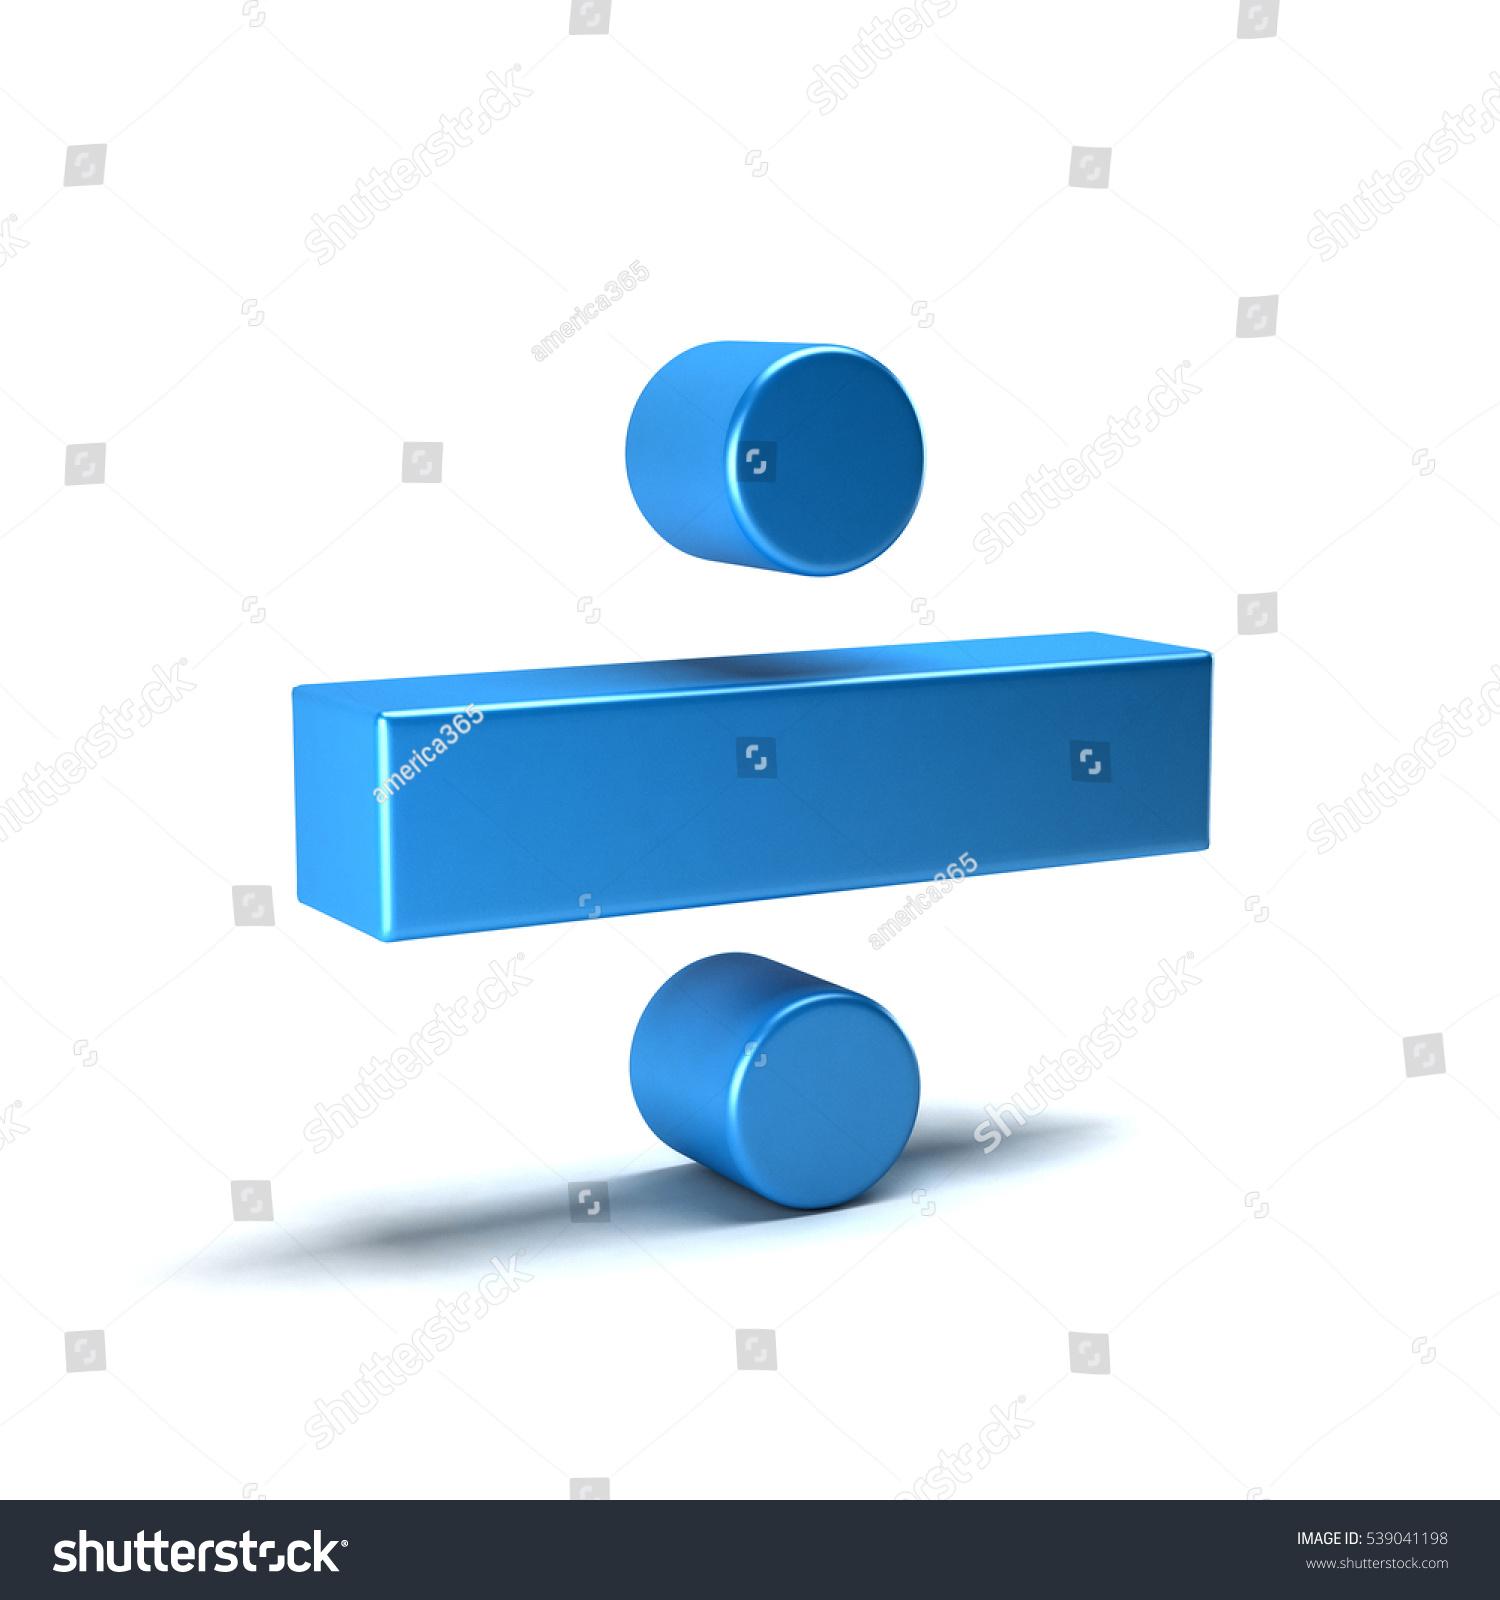 Divide Math Symbol 3 D Rendering Illustration Stock Illustration